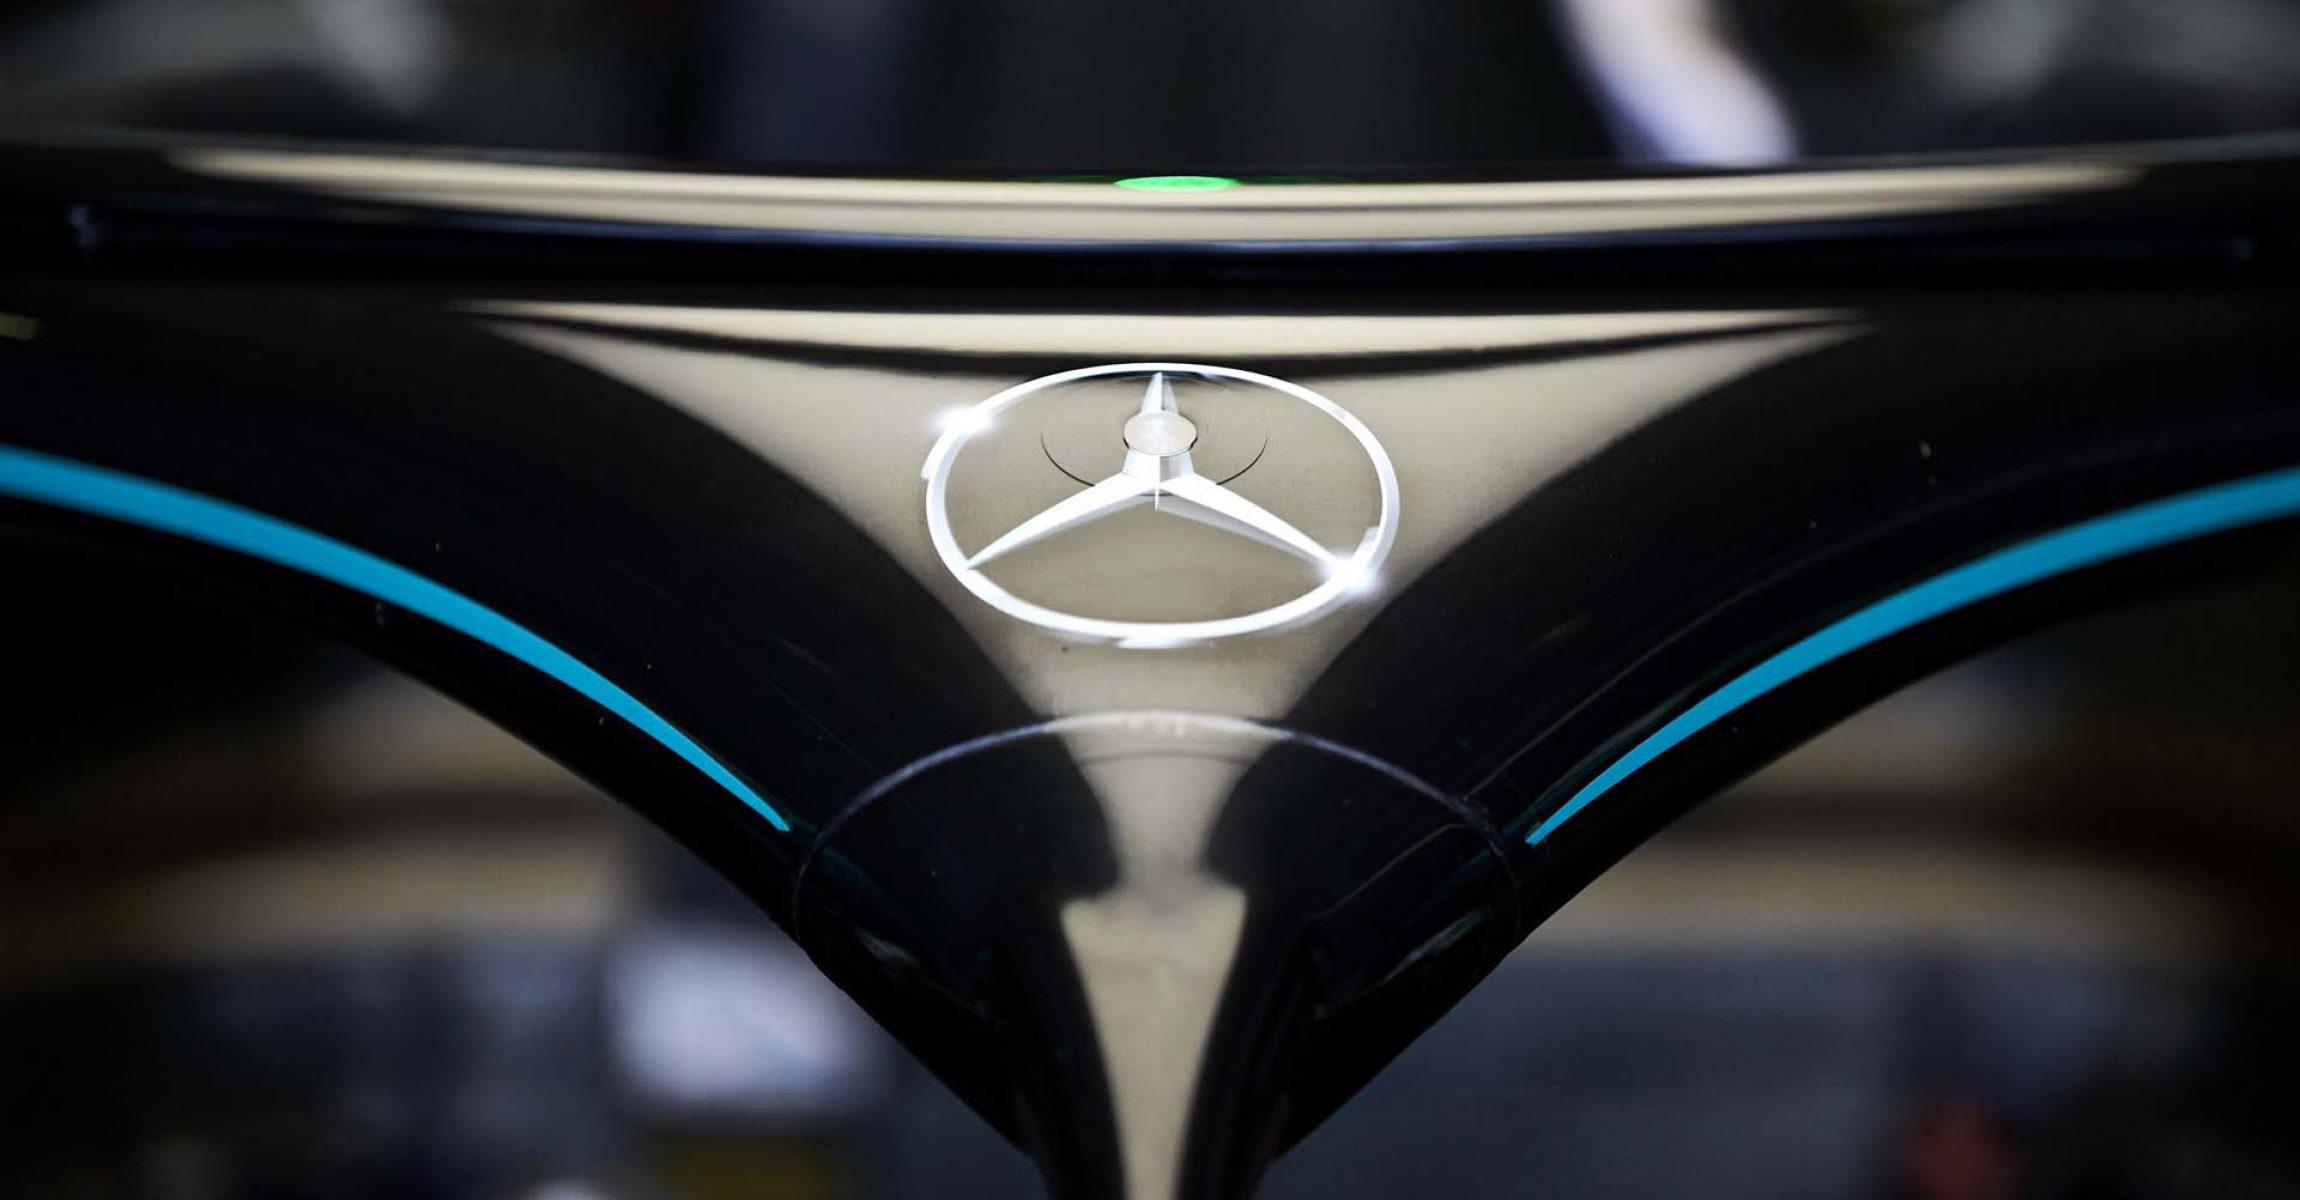 2020 70th Anniversary Grand Prix, Saturday - Steve Etherington Merceds logo Halo